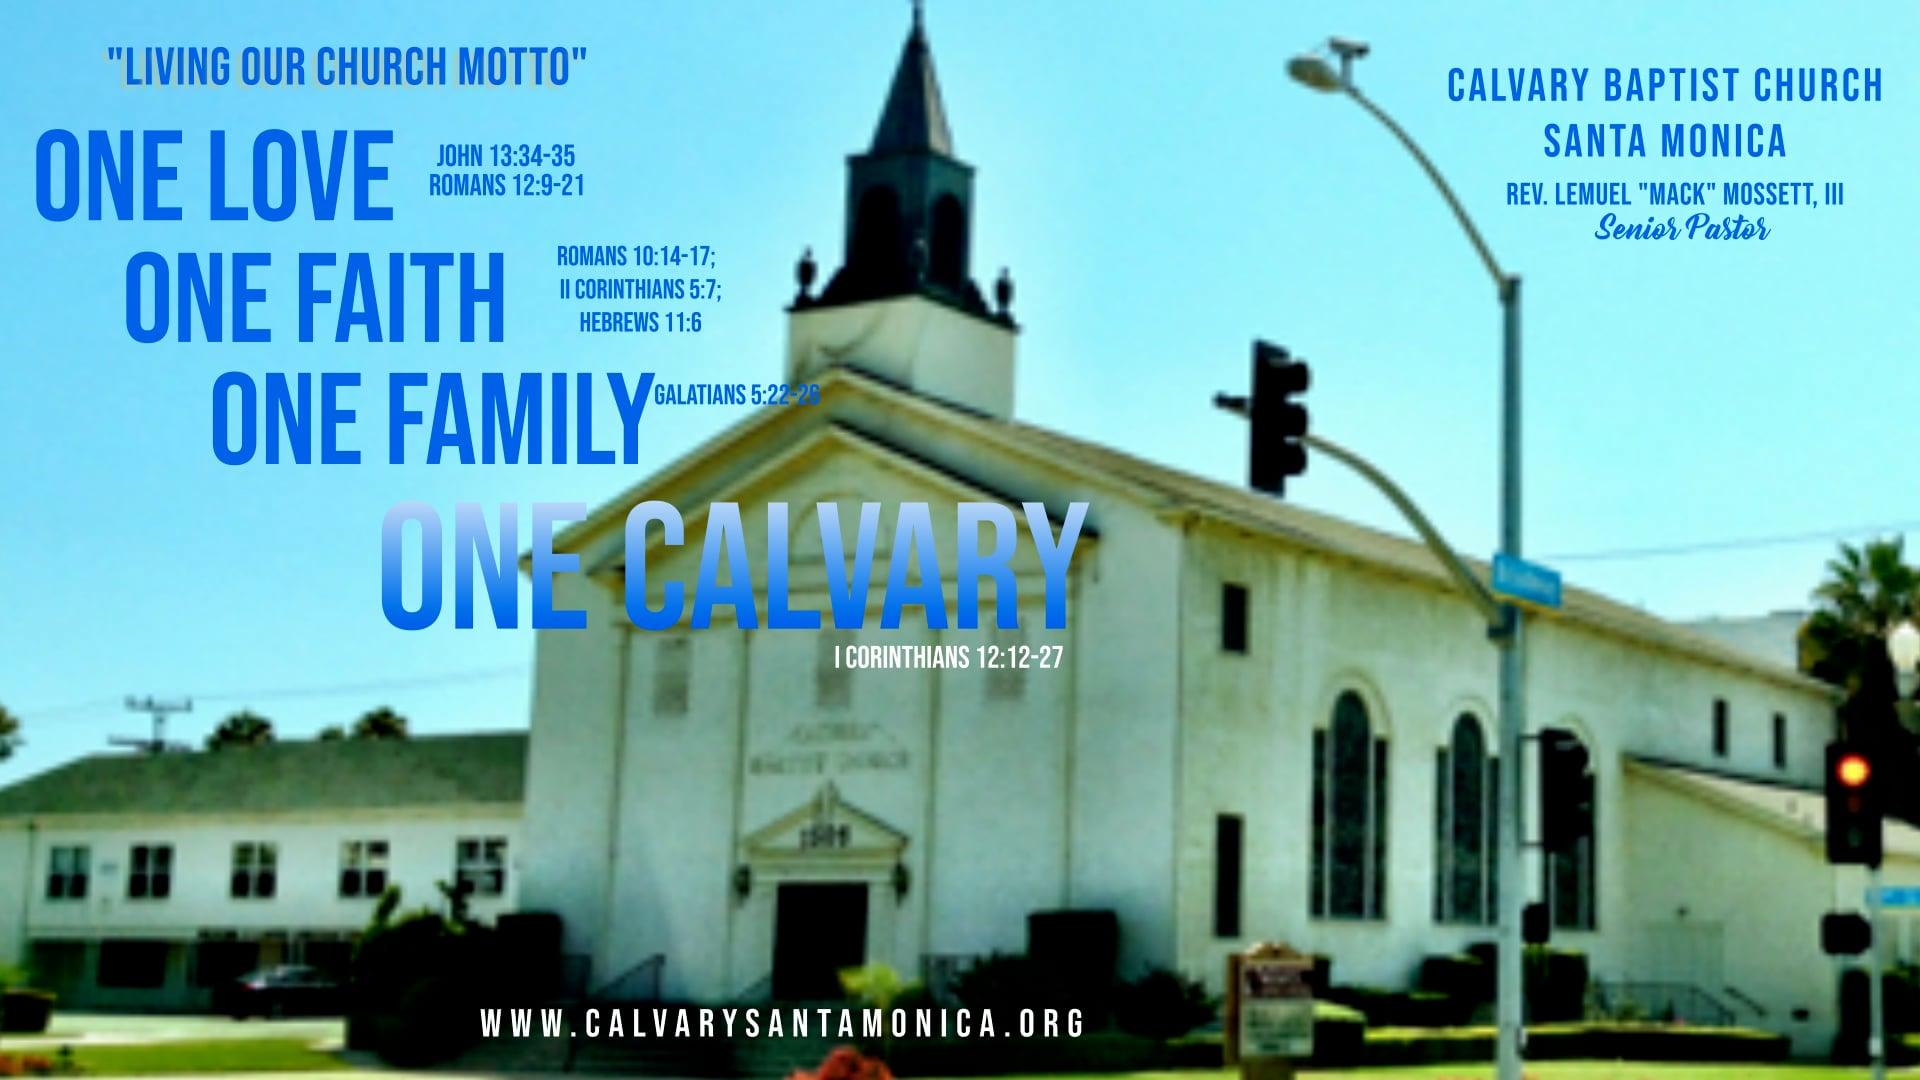 09.19.21 Calvary Baptist Church Worship Service